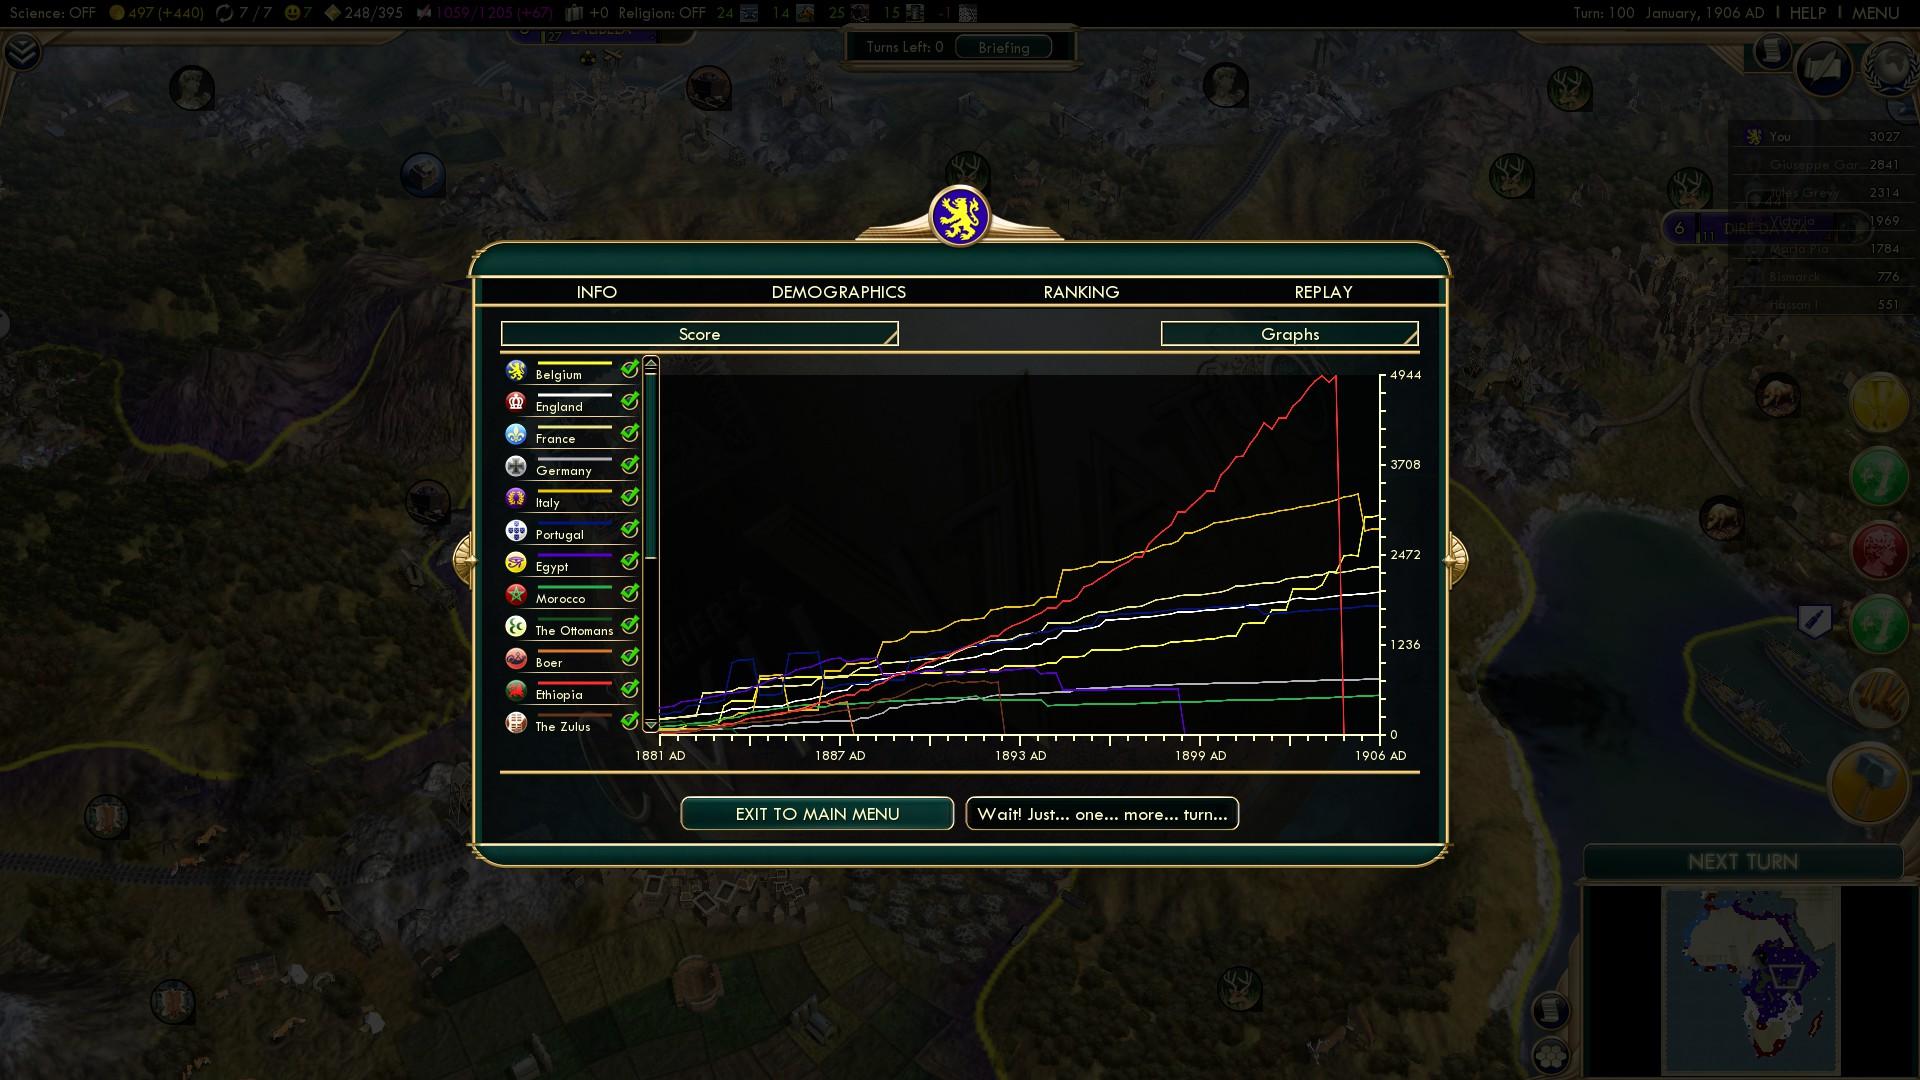 Civilization 5 Scramble for Africa - Belgium Deity 2020 - Score Graph